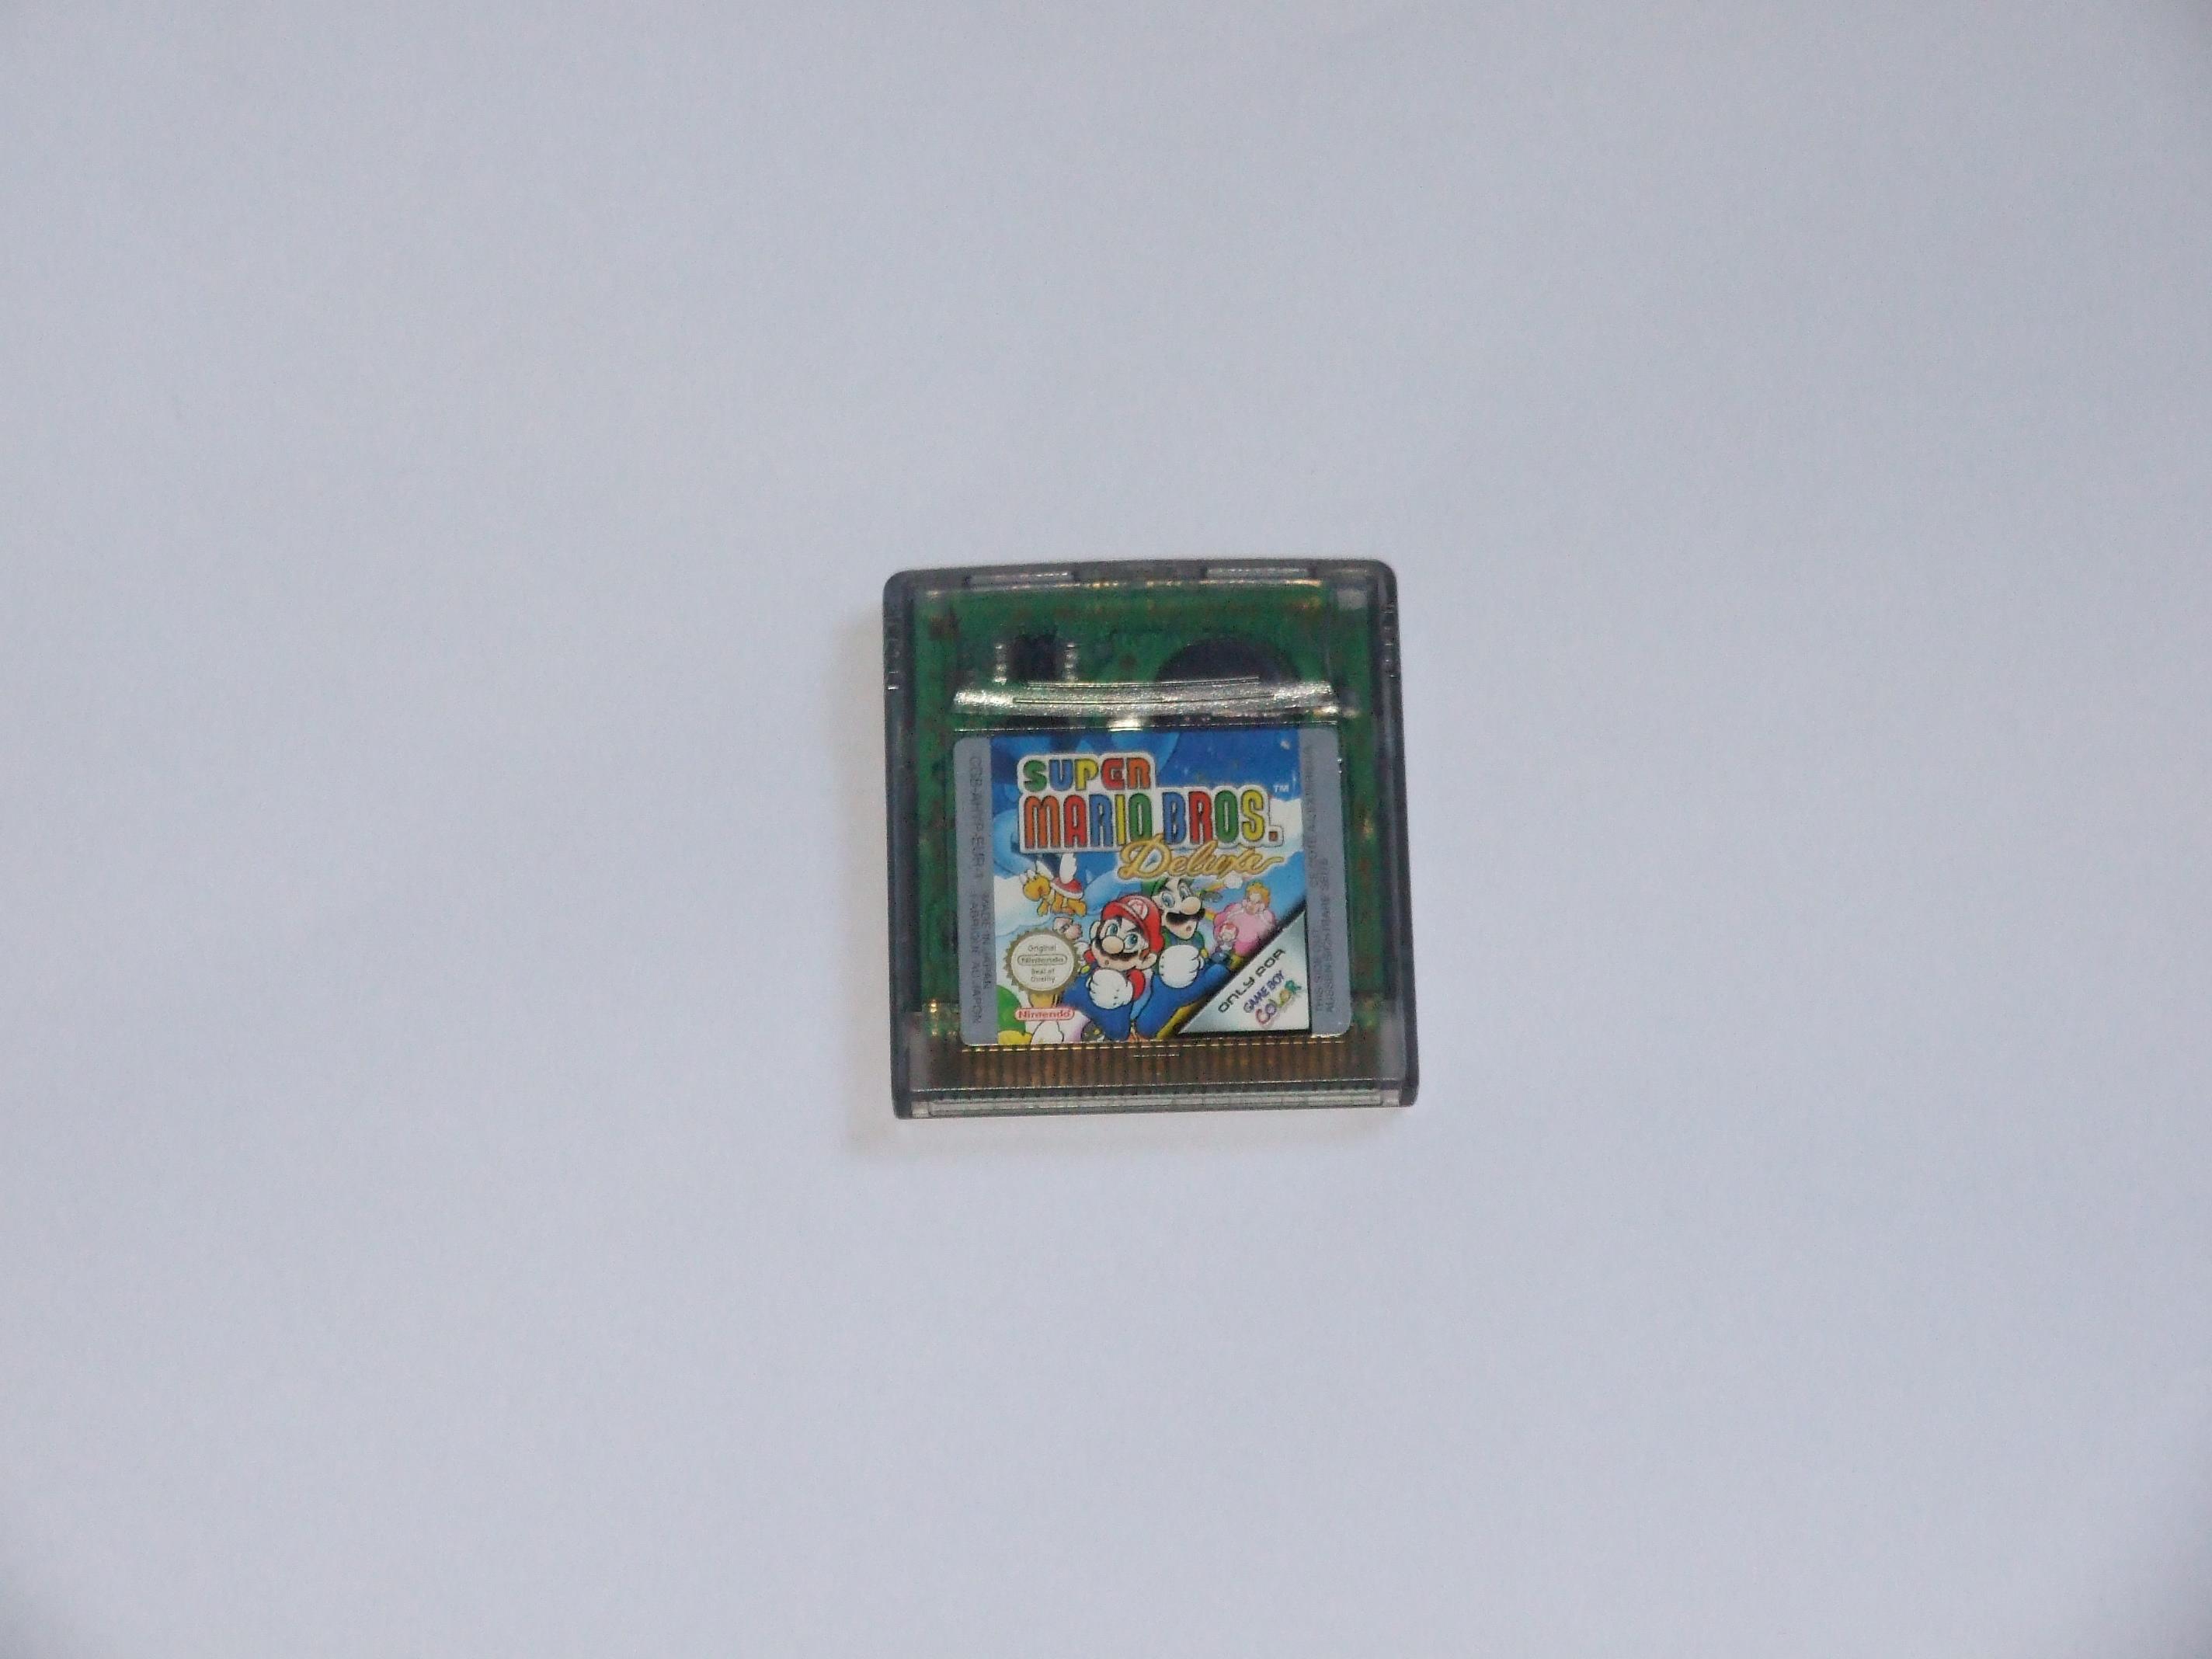 Super Mario Bros. Deluxe (Cartridge)